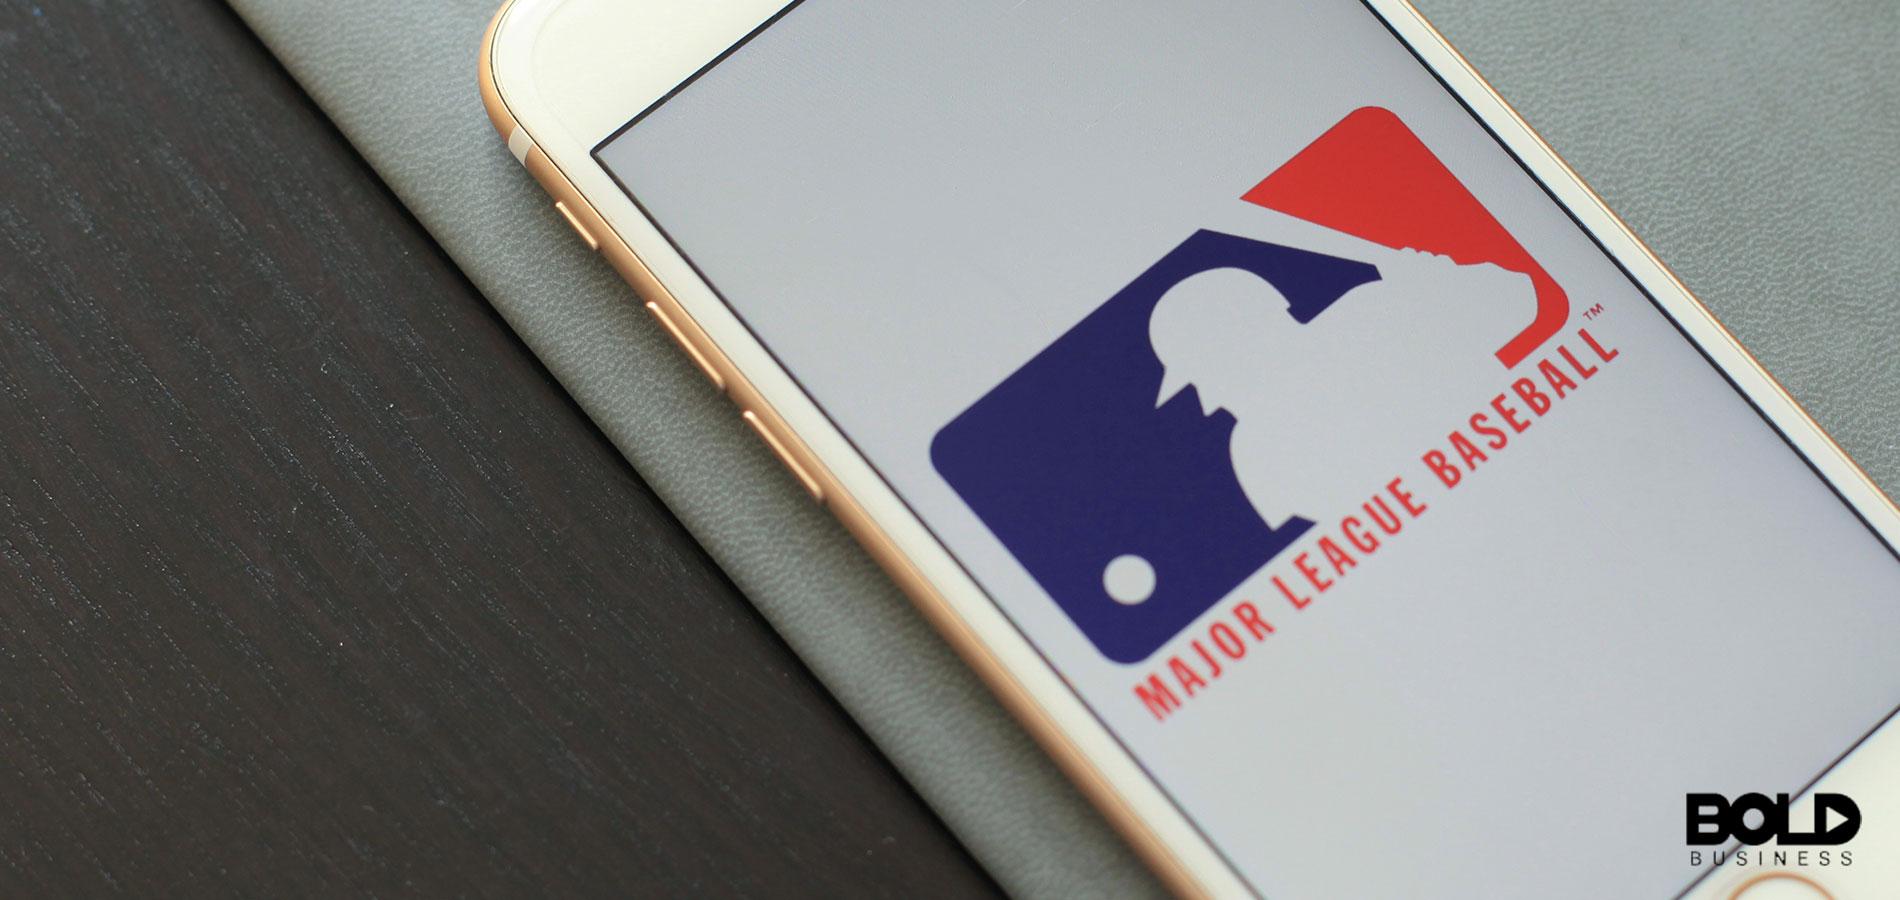 A Major League Baseball app